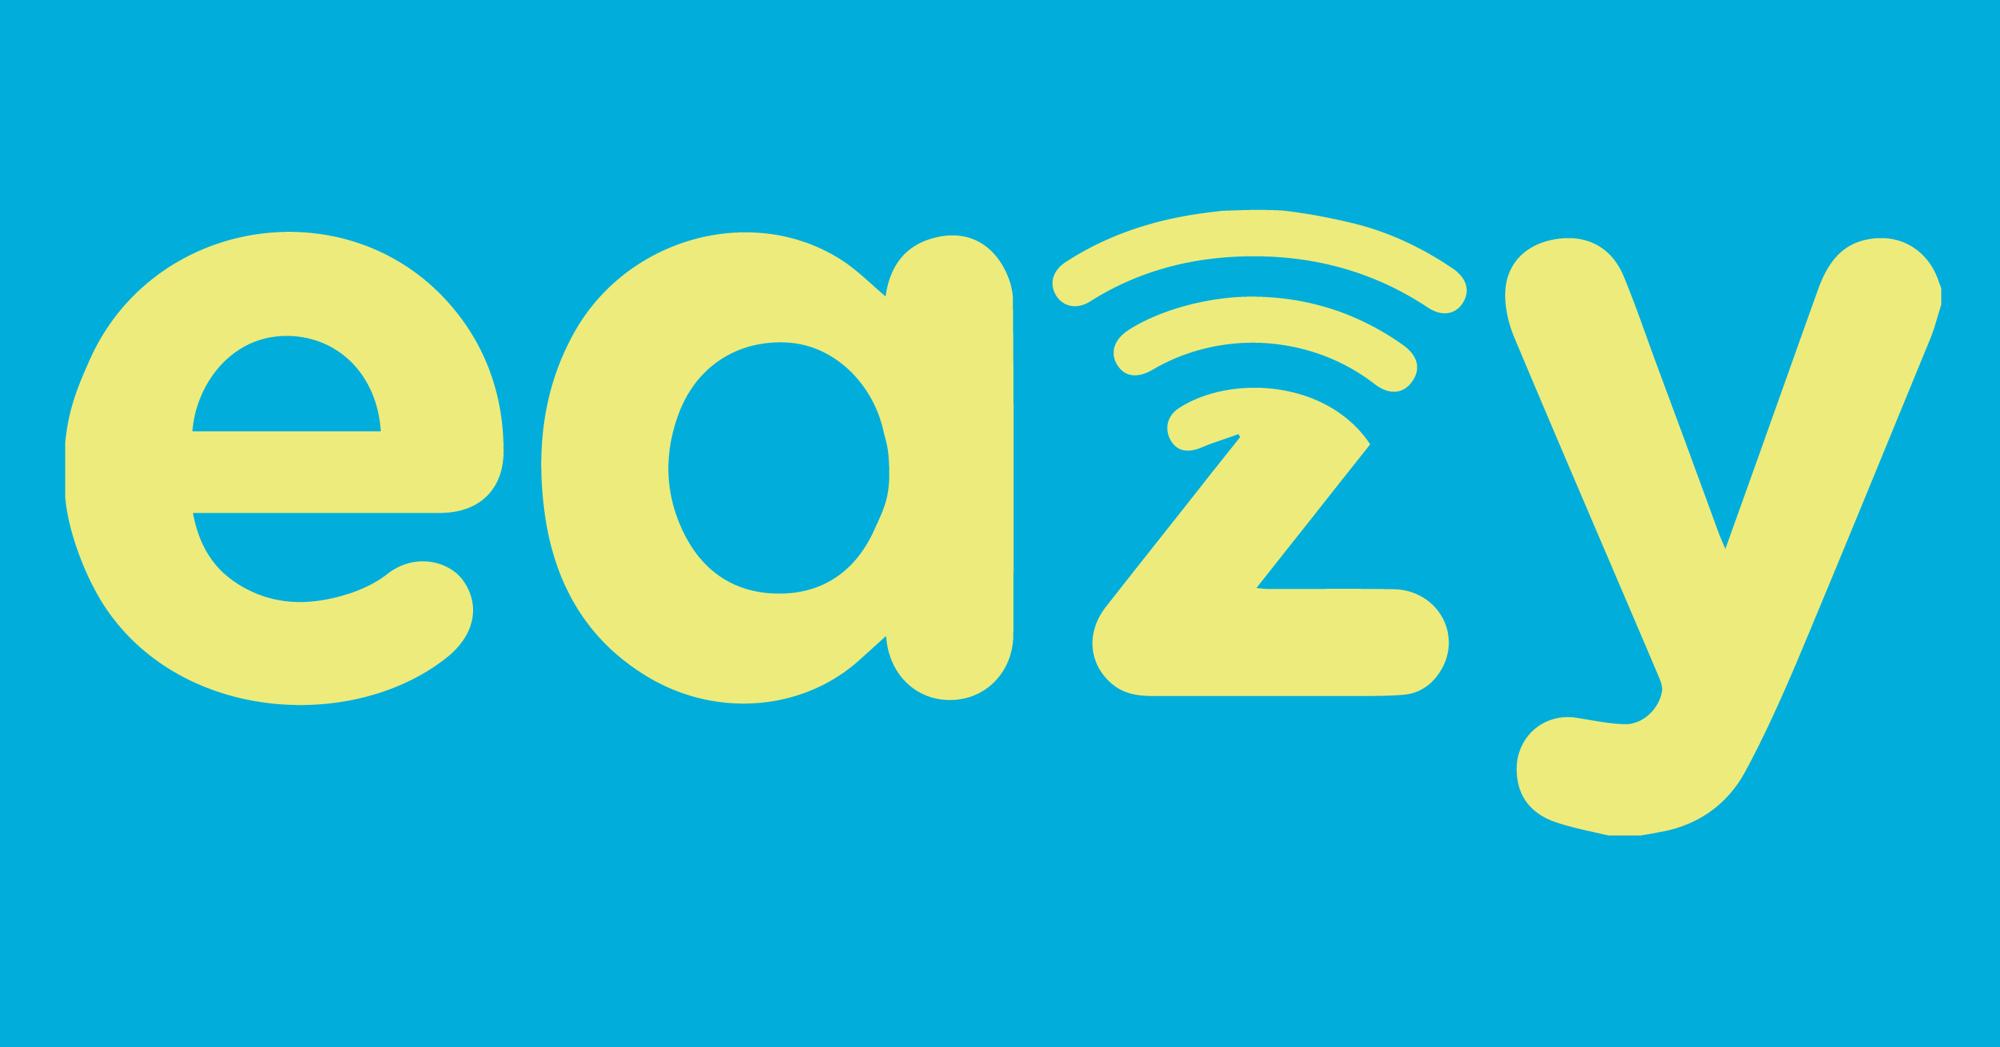 eazy 20 od. 50 (20 - 50 Mbit/s) ohne Anschlussgebühr + WLAN-Router ab 11,99€ / Monat